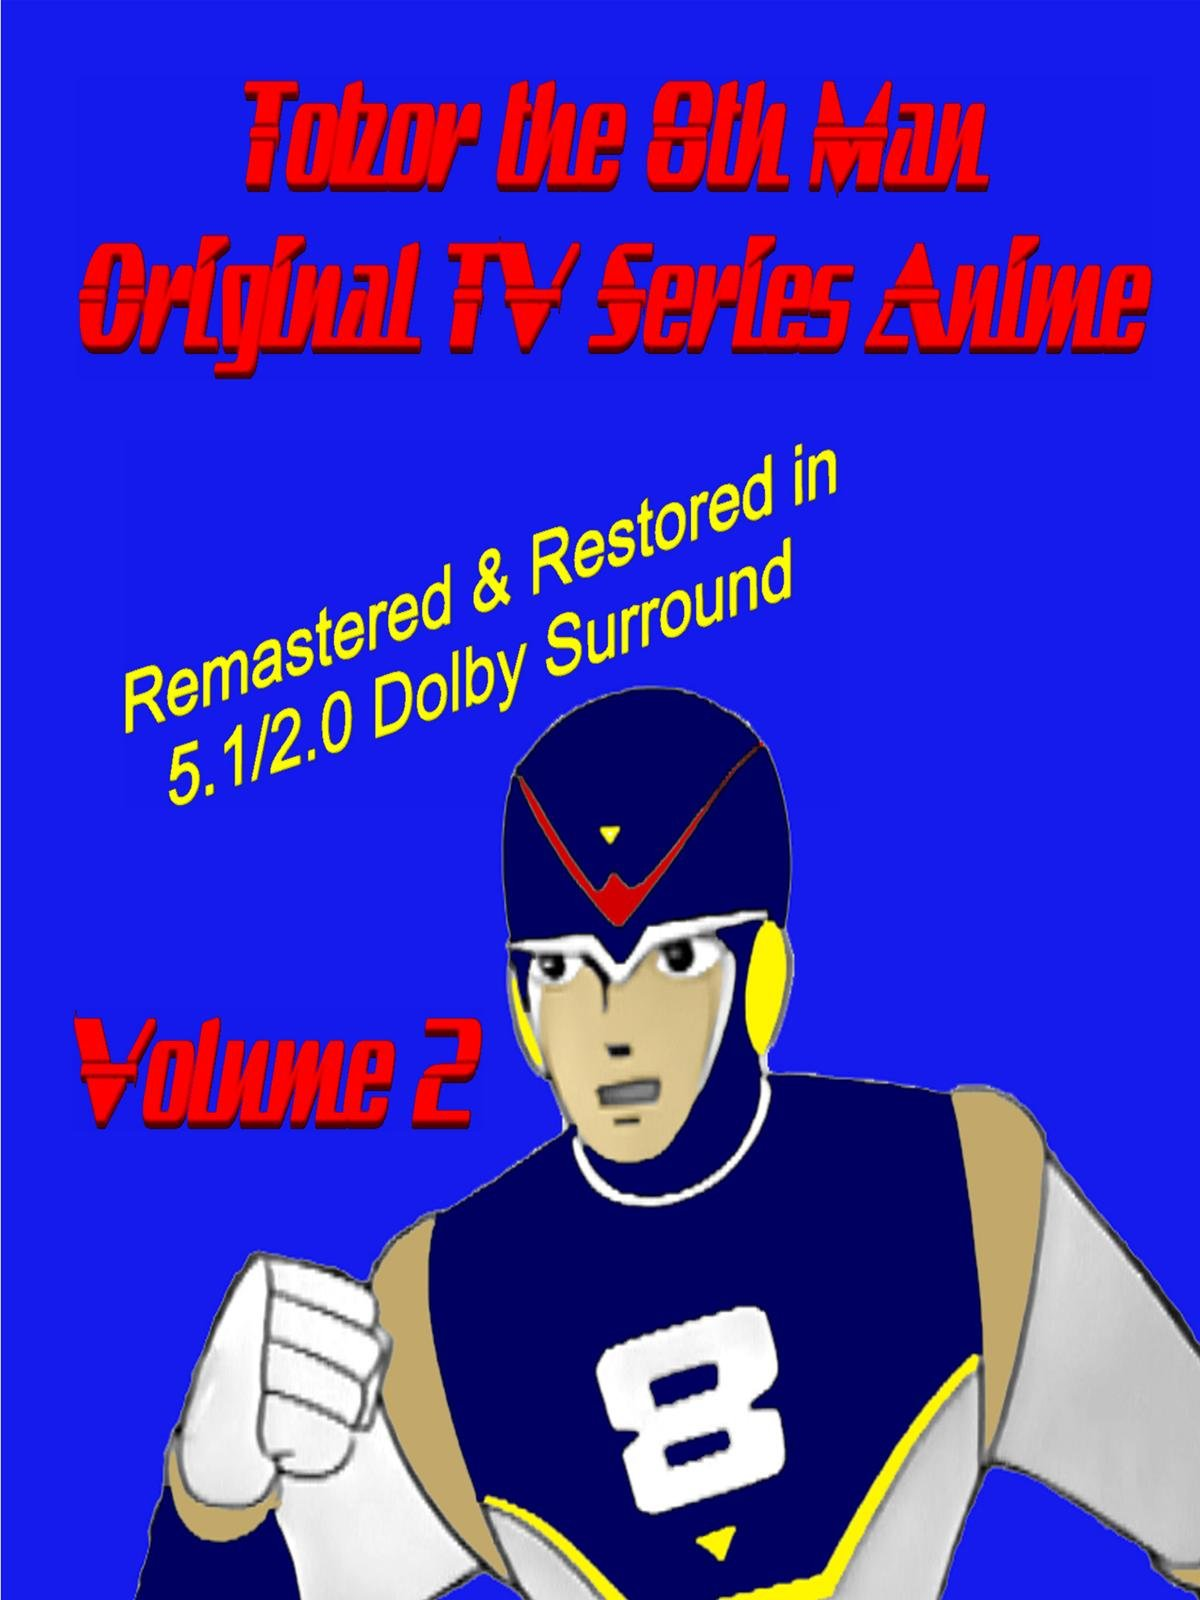 Tobor the 8th Man Original TV Series Anime Vol. 2 [Remastered & Restored]